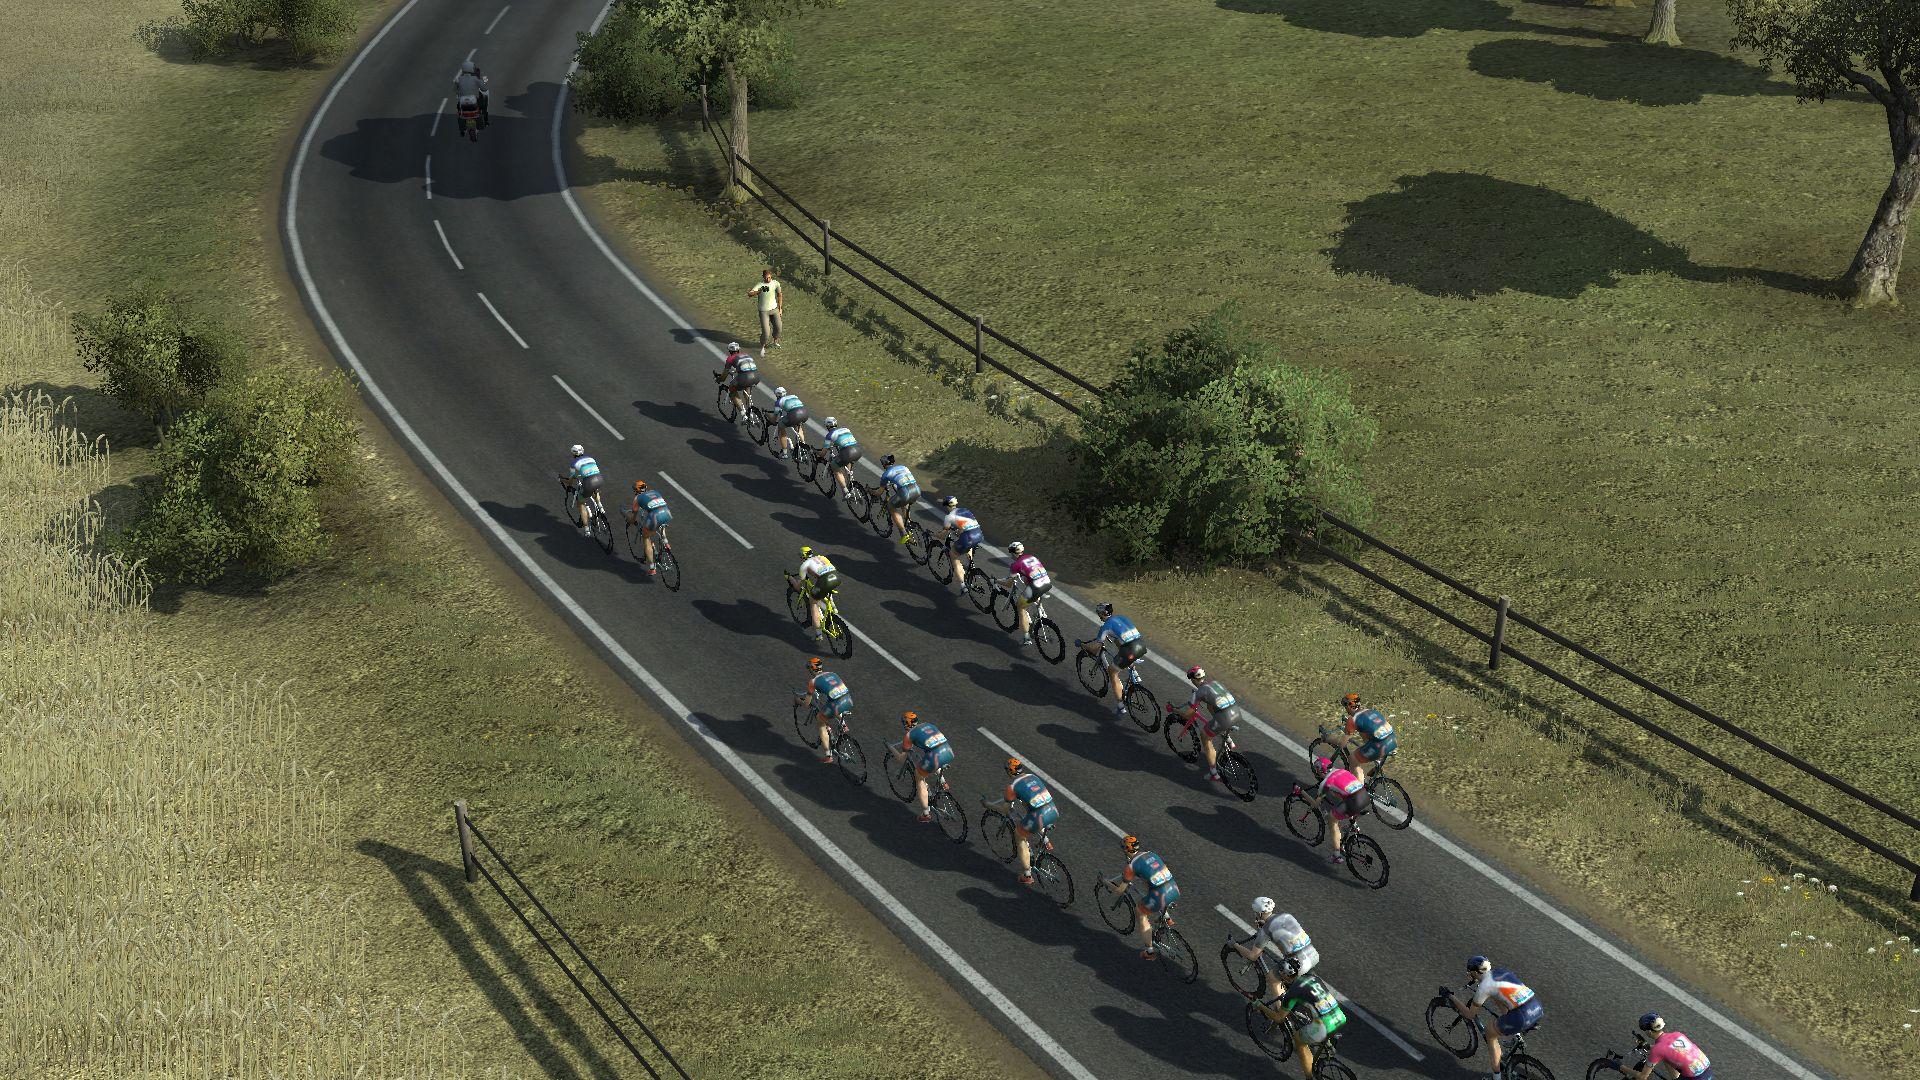 pcmdaily.com/images/mg/2018/Races/GTM/Giro/mg18_giro_07_PCM0086.jpg